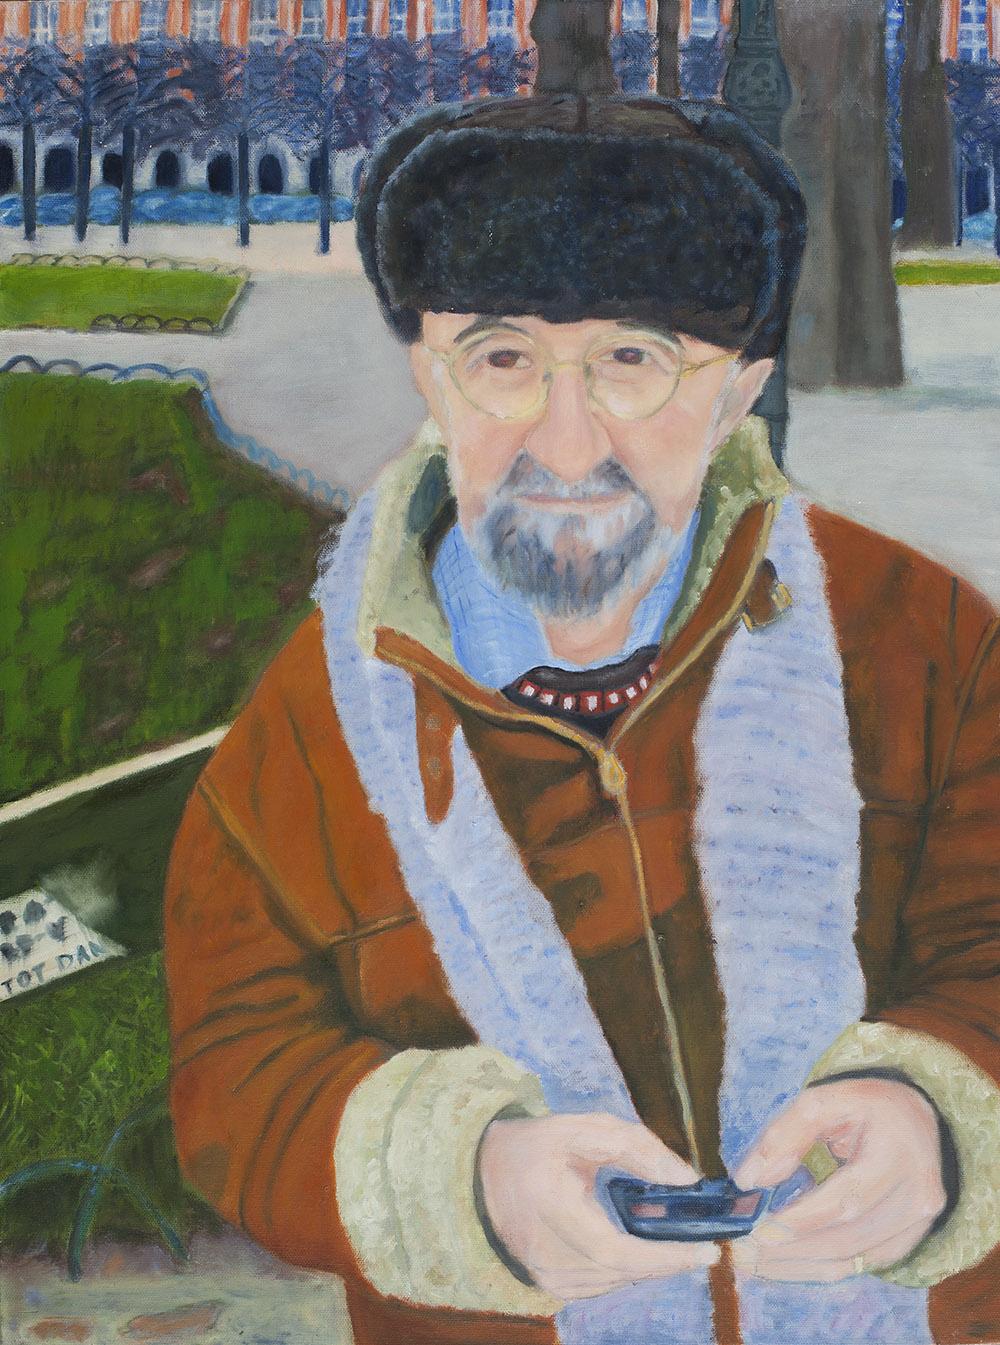 3.-Ono-Piero-2015.-Oil-on-canvas-61-x-45.7-cm-x.jpg